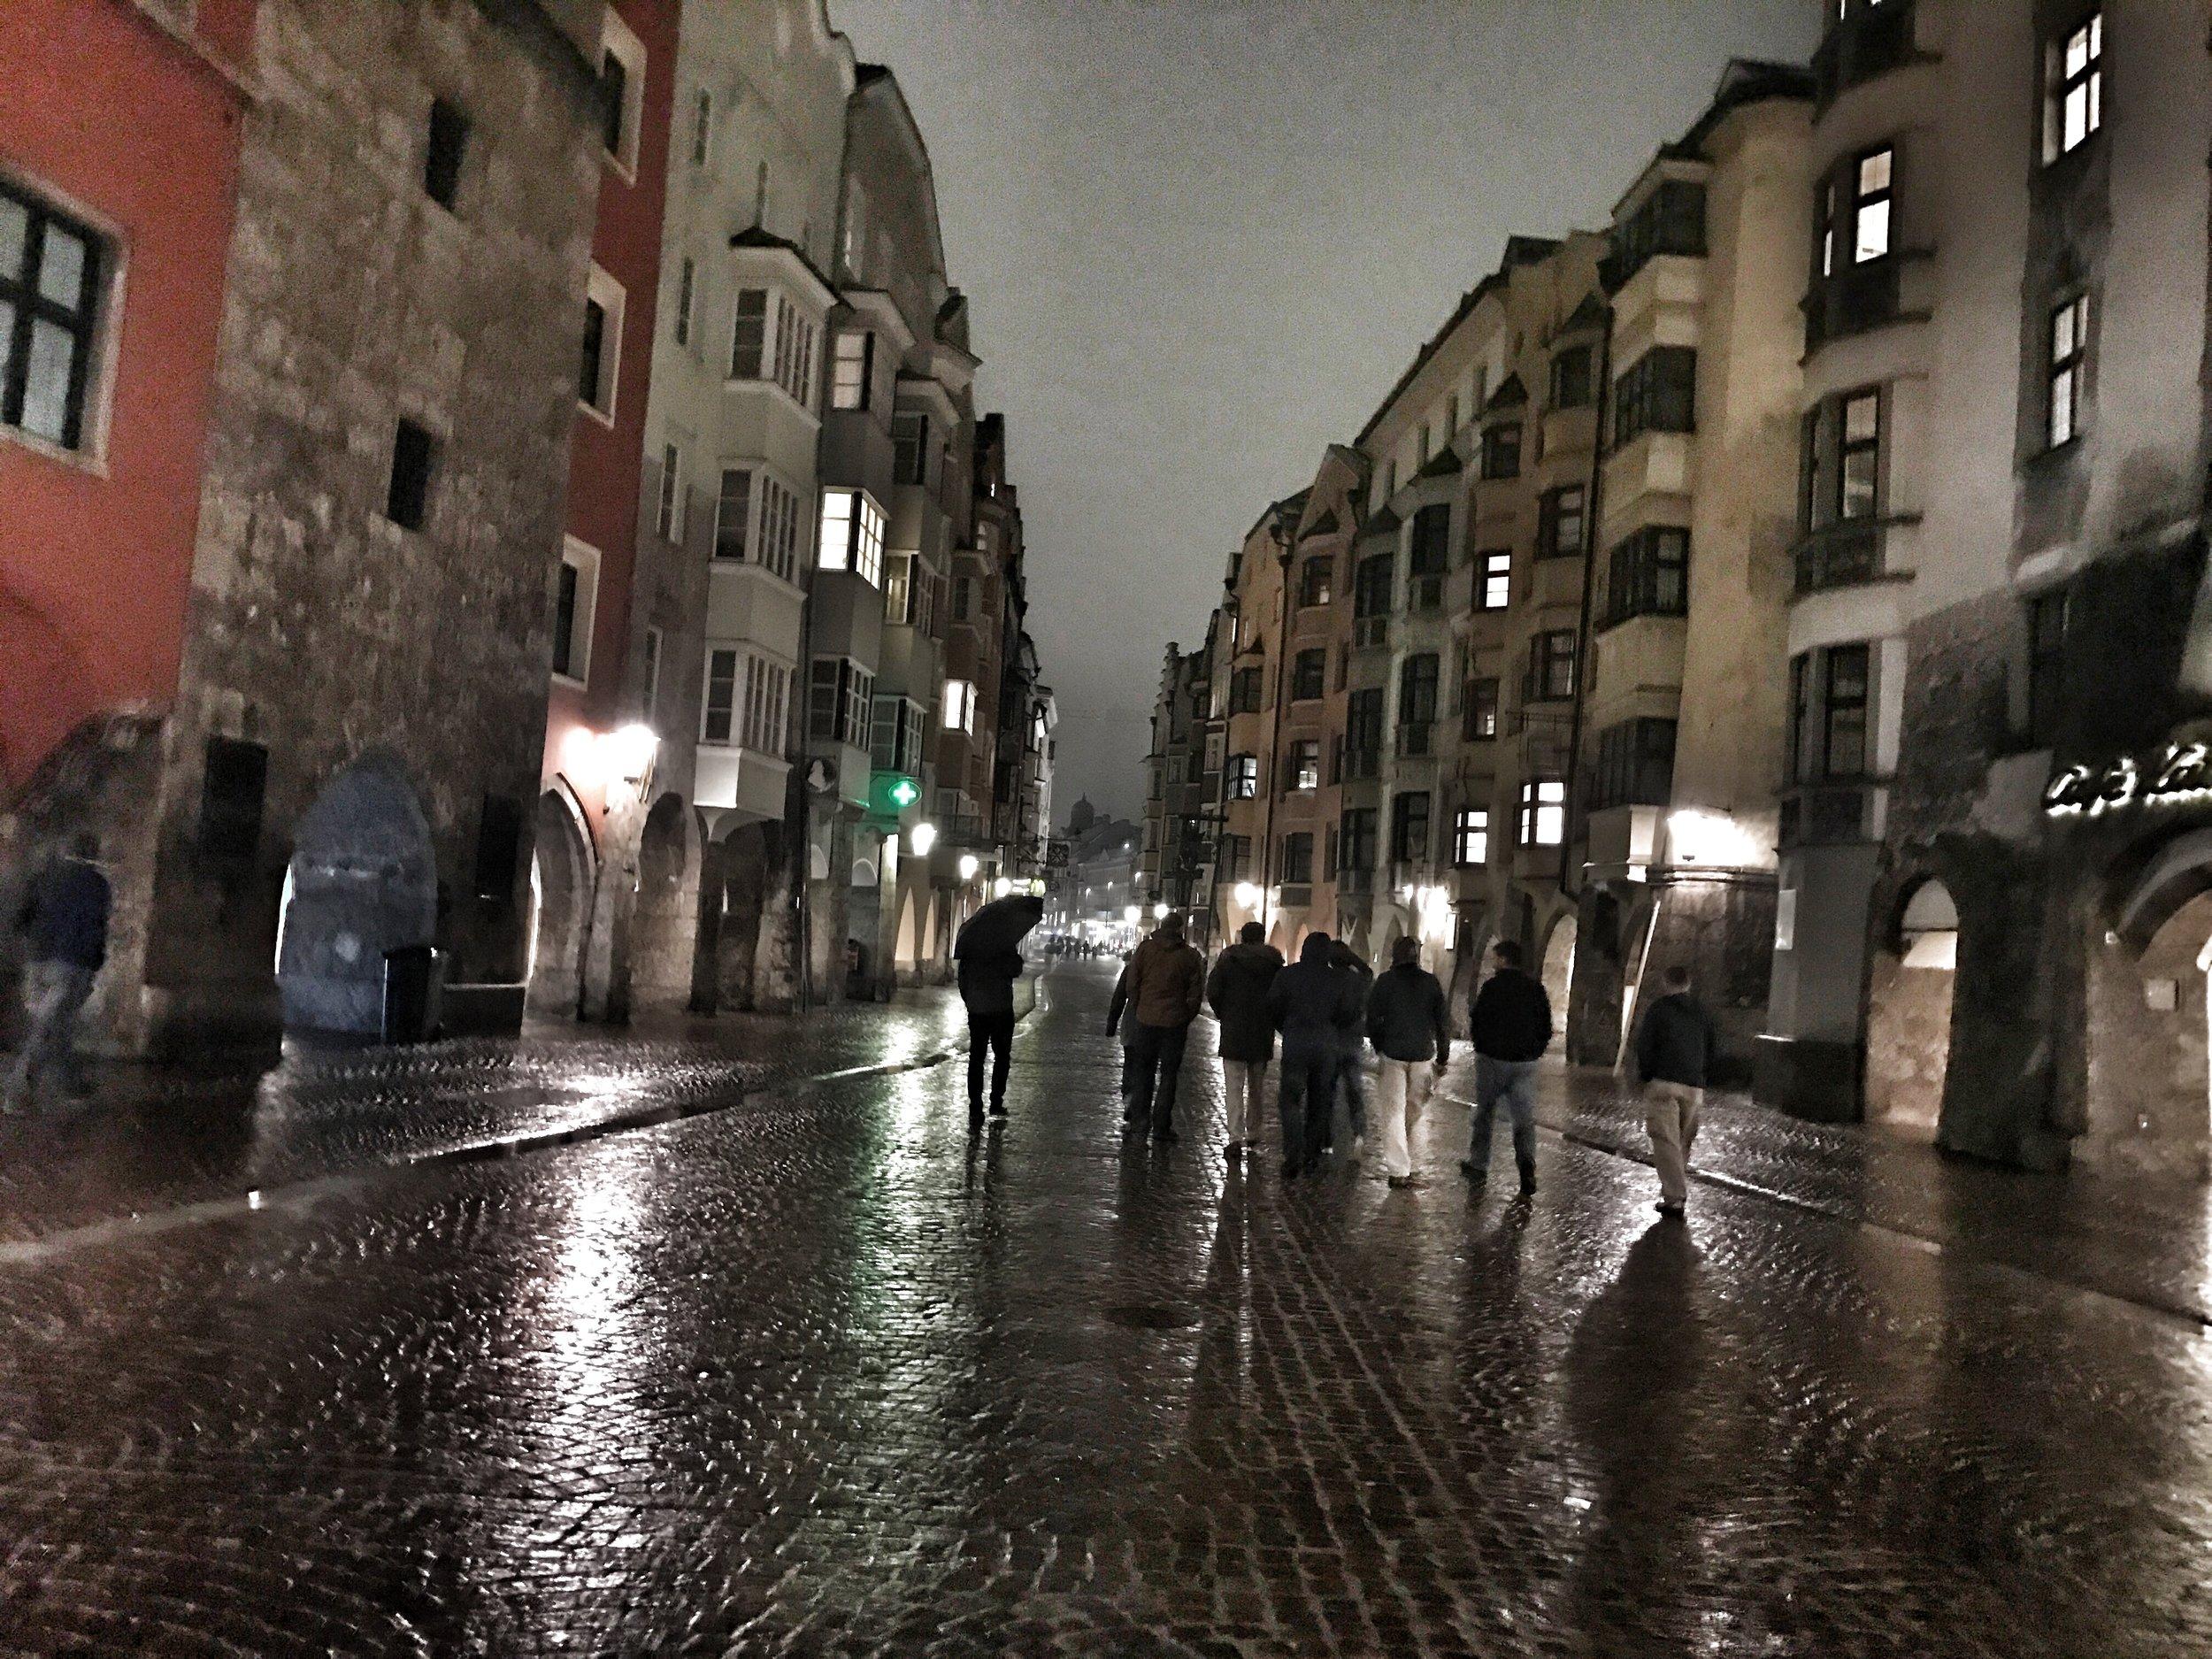 Birders wandering the streets of Innsbruck on a rainy night.